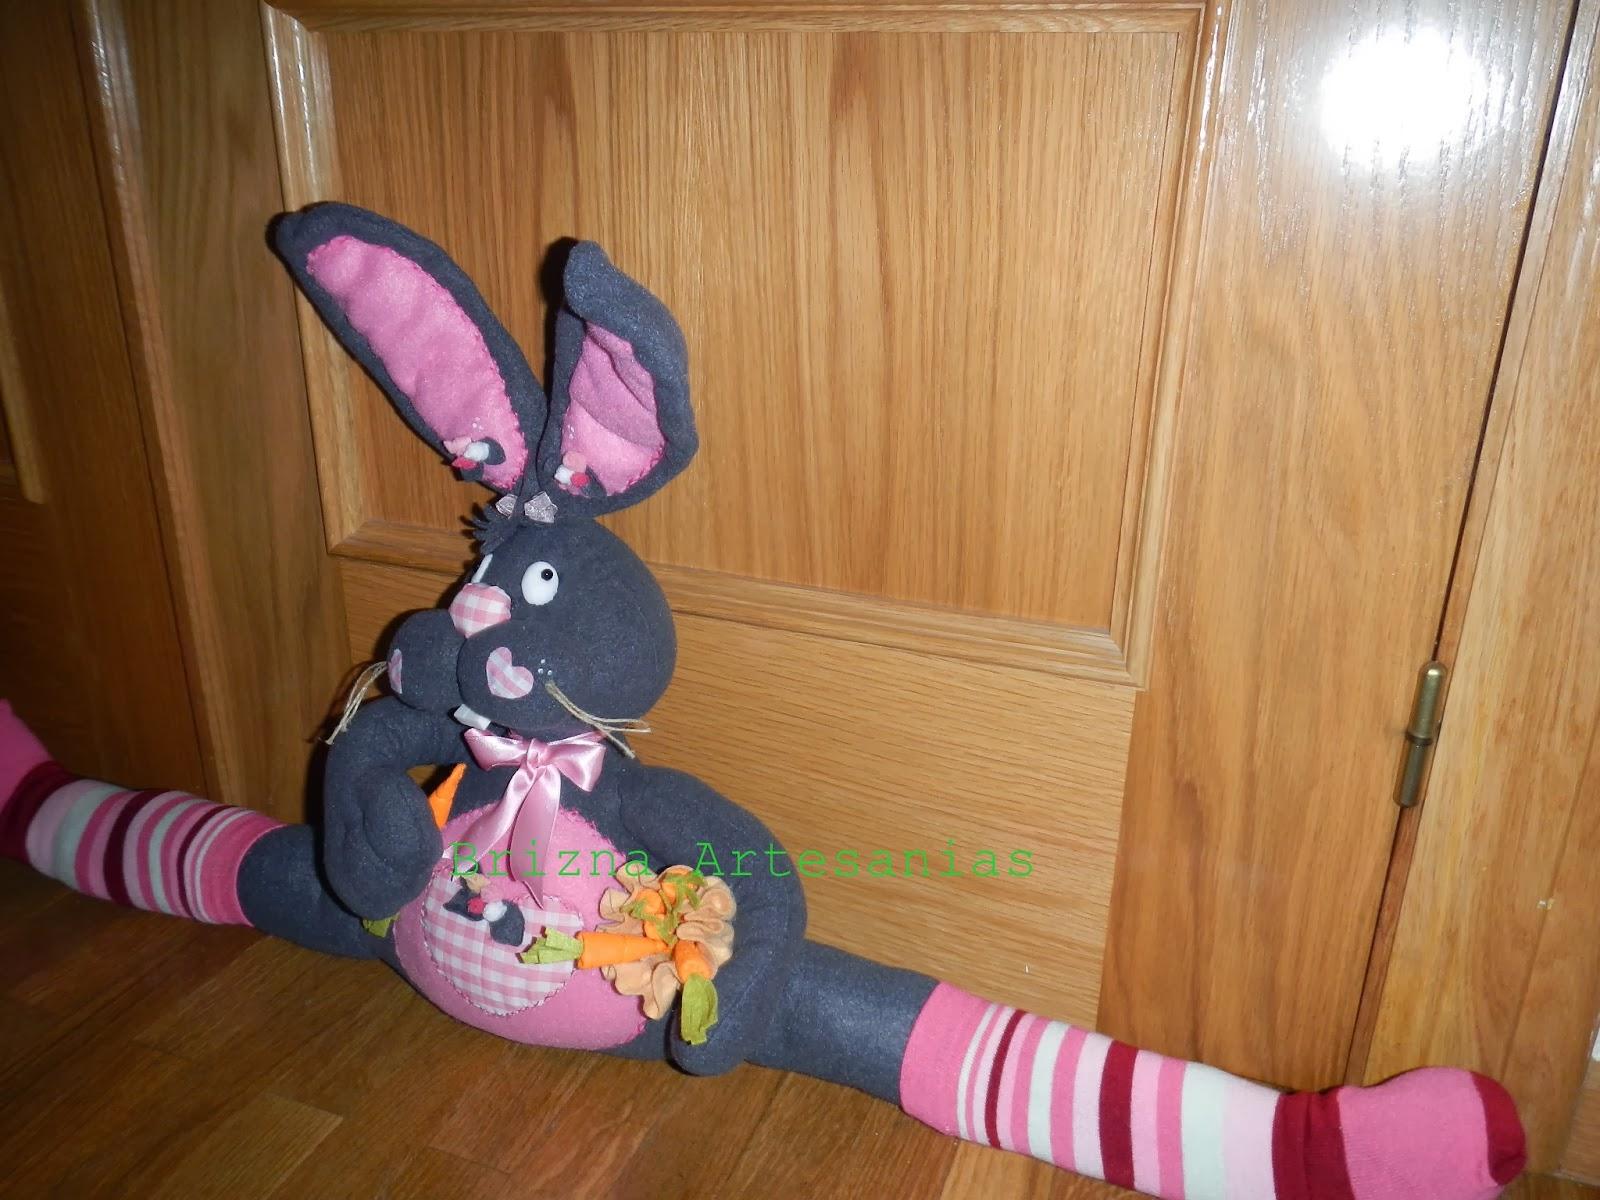 Brizna artesan as burlete decorativo for Burlete puerta decorativo